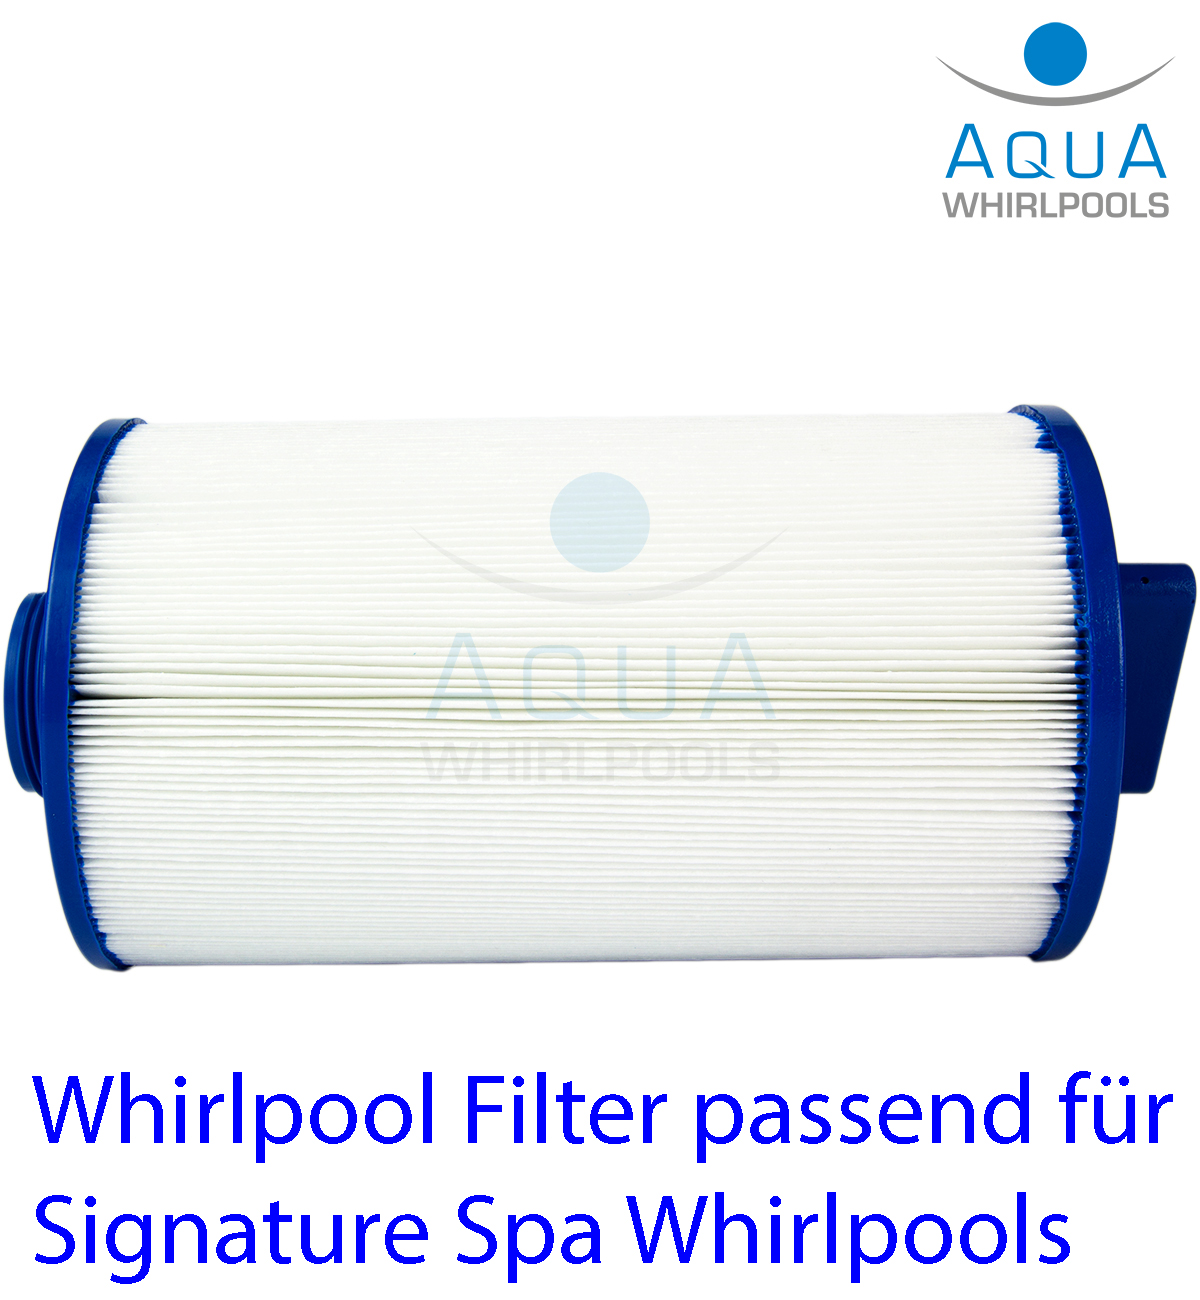 Whirlpool filter passend f r signature spa whirlpools blog aqua whirlpools - Aqua whirlpools ...